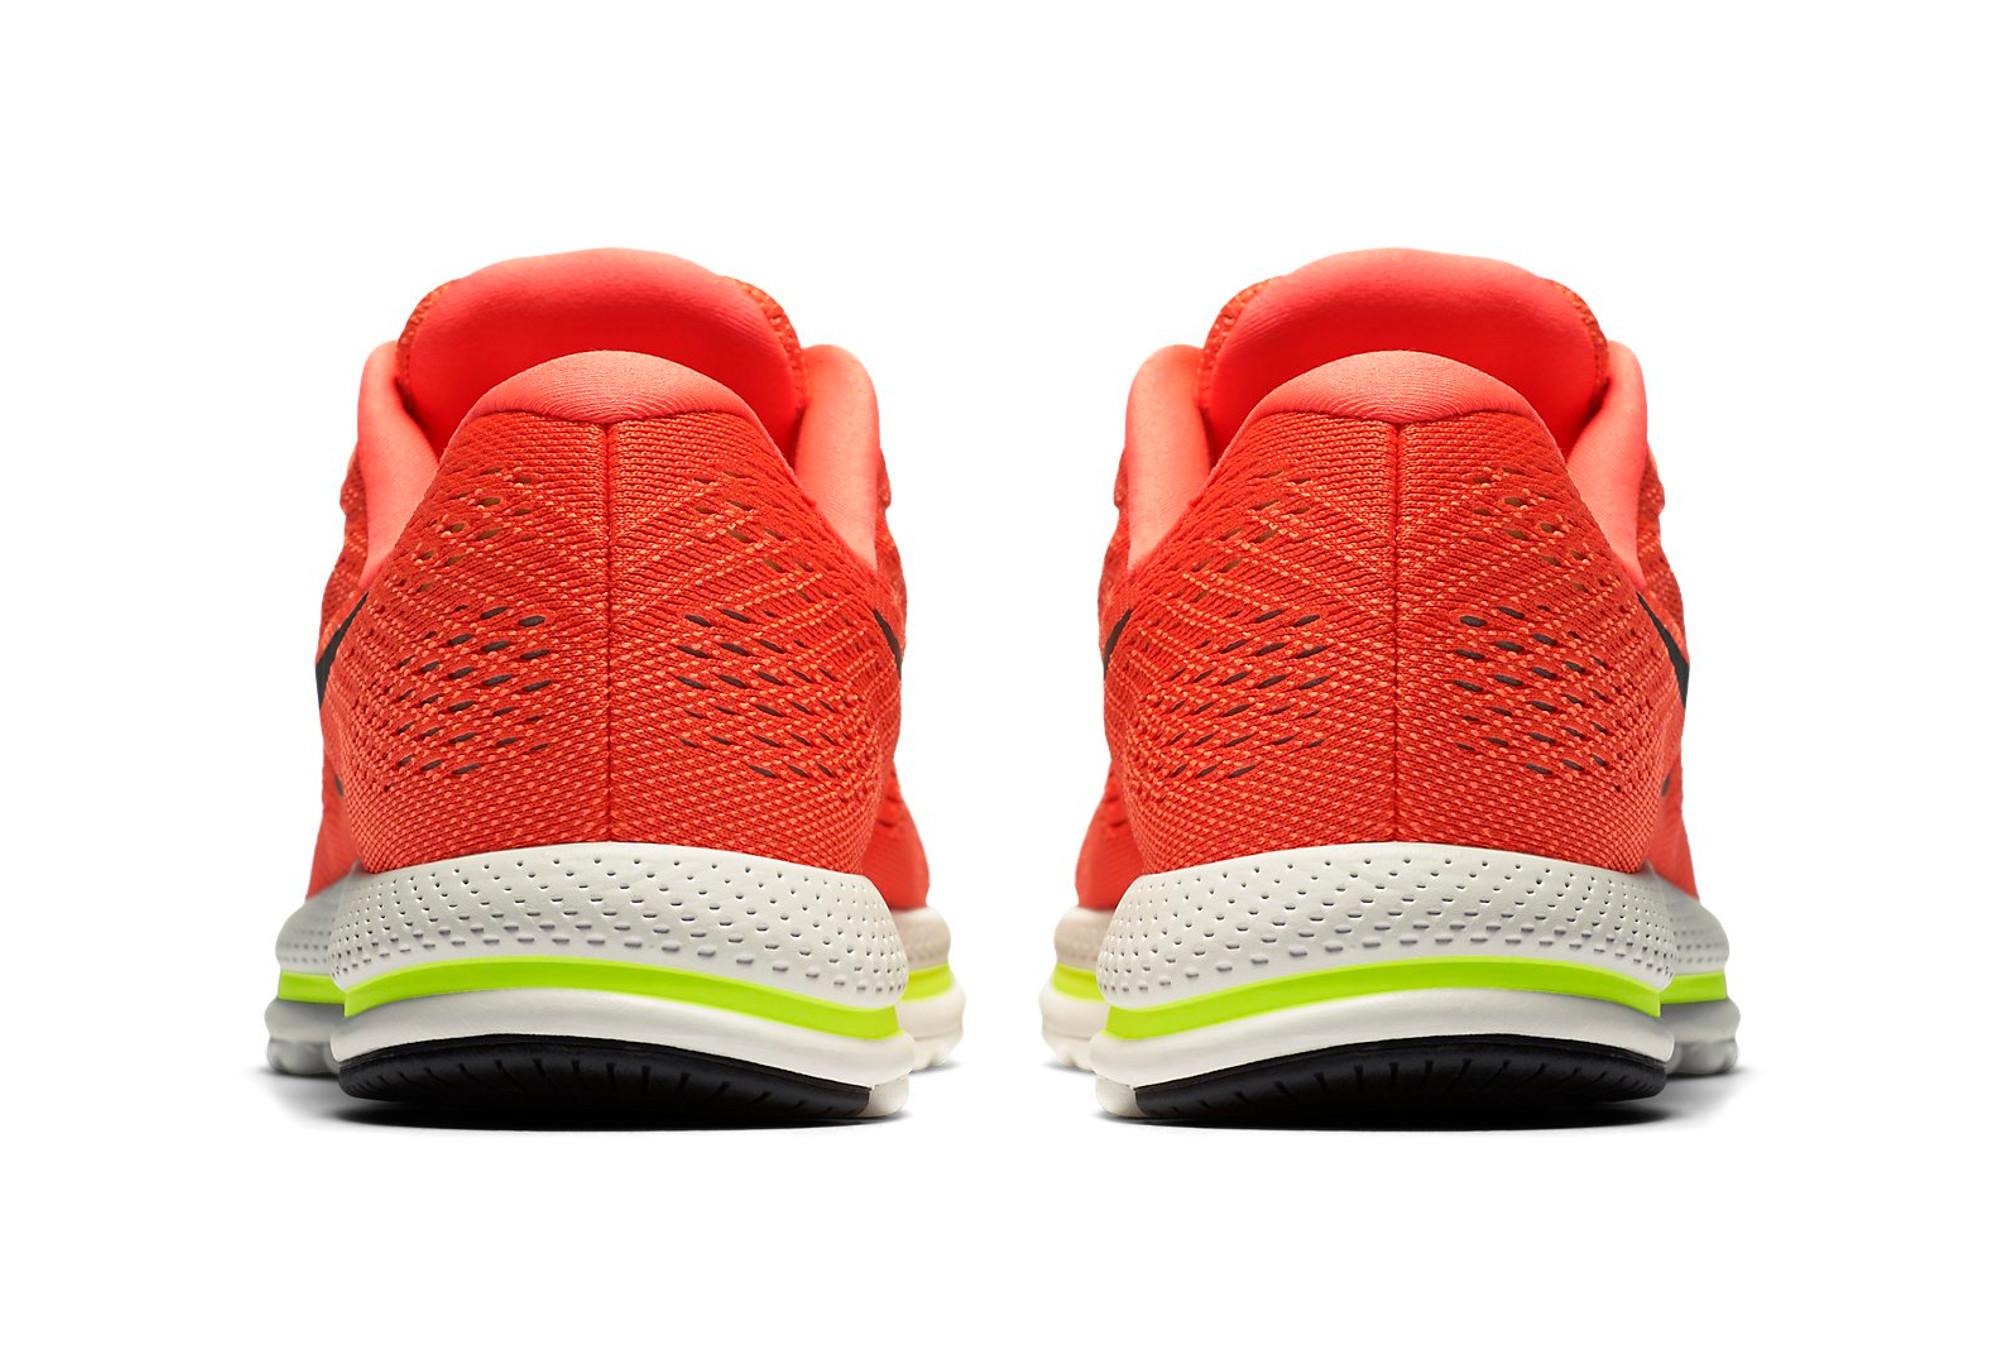 46f04057f Zapatillas Nike AIR ZOOM VOMERO 12 para Hombre Naranja